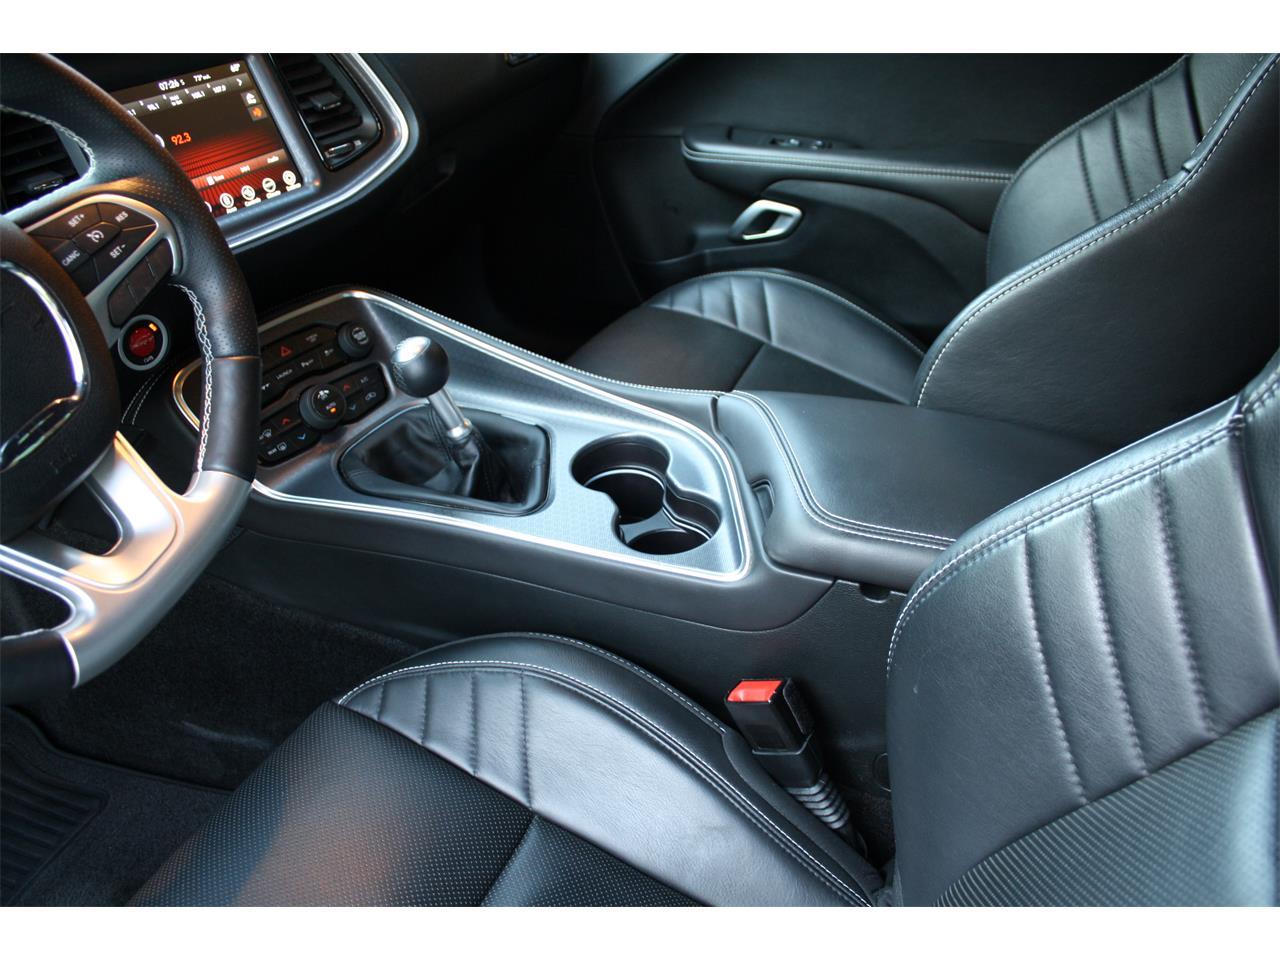 2017 Dodge Challenger (CC-1413846) for sale in Tucson, Arizona